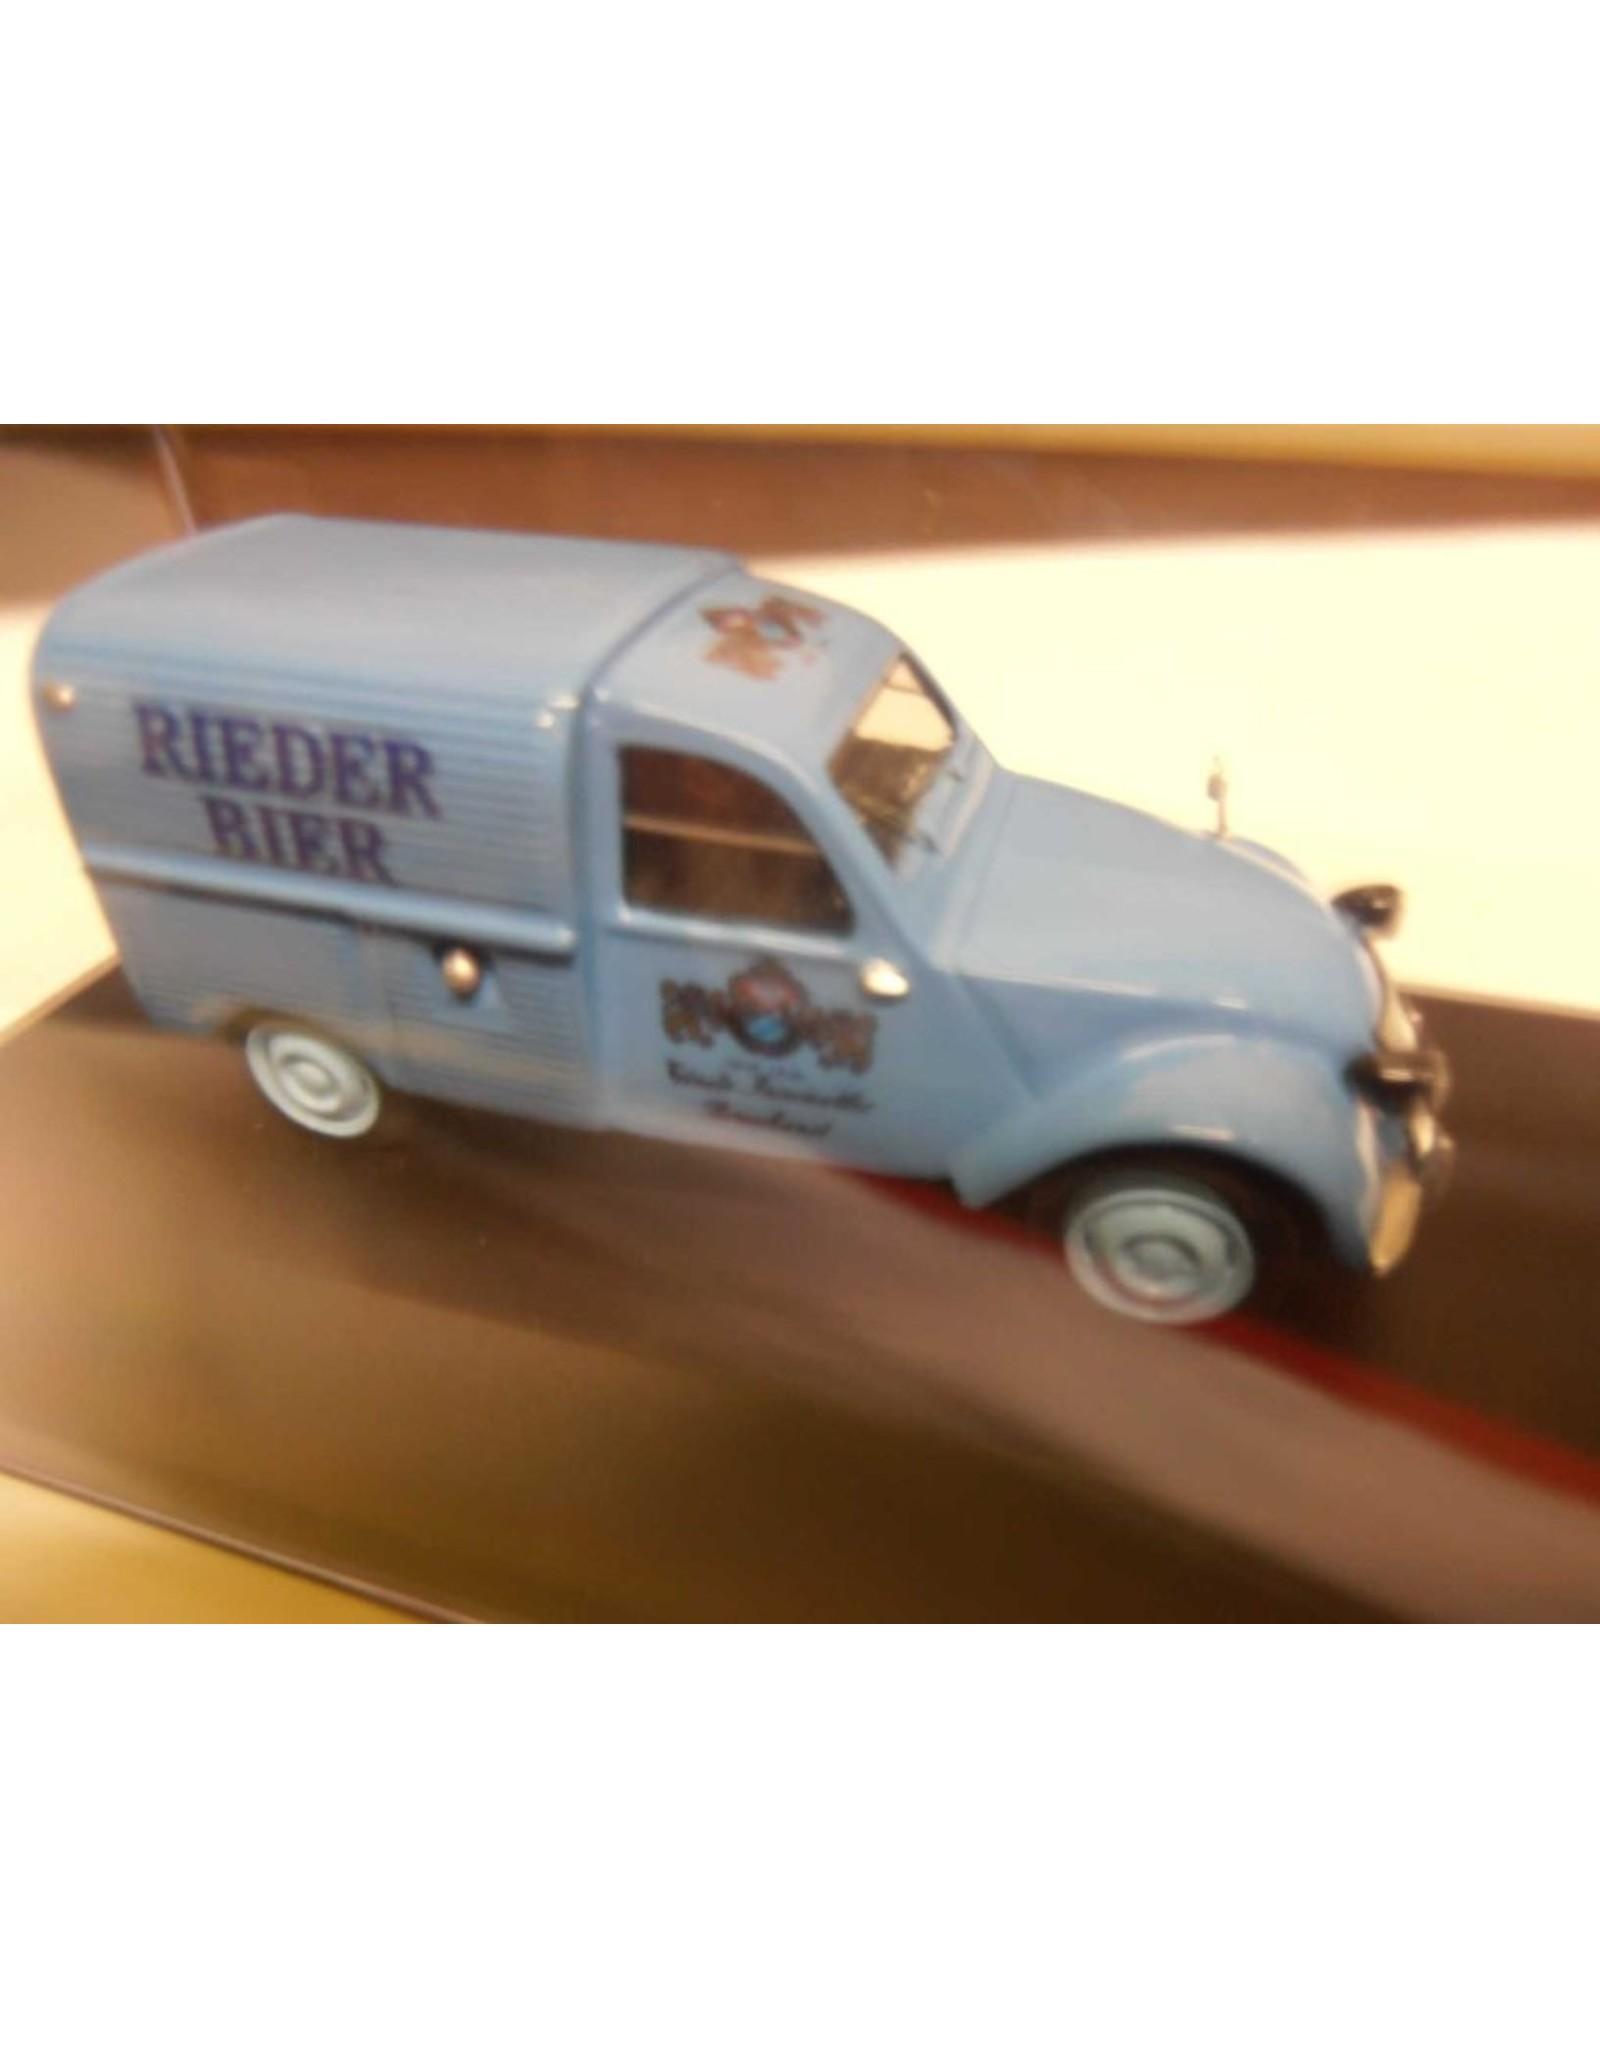 "Citroën CITROËN 2CV RIEDER BIER"""""